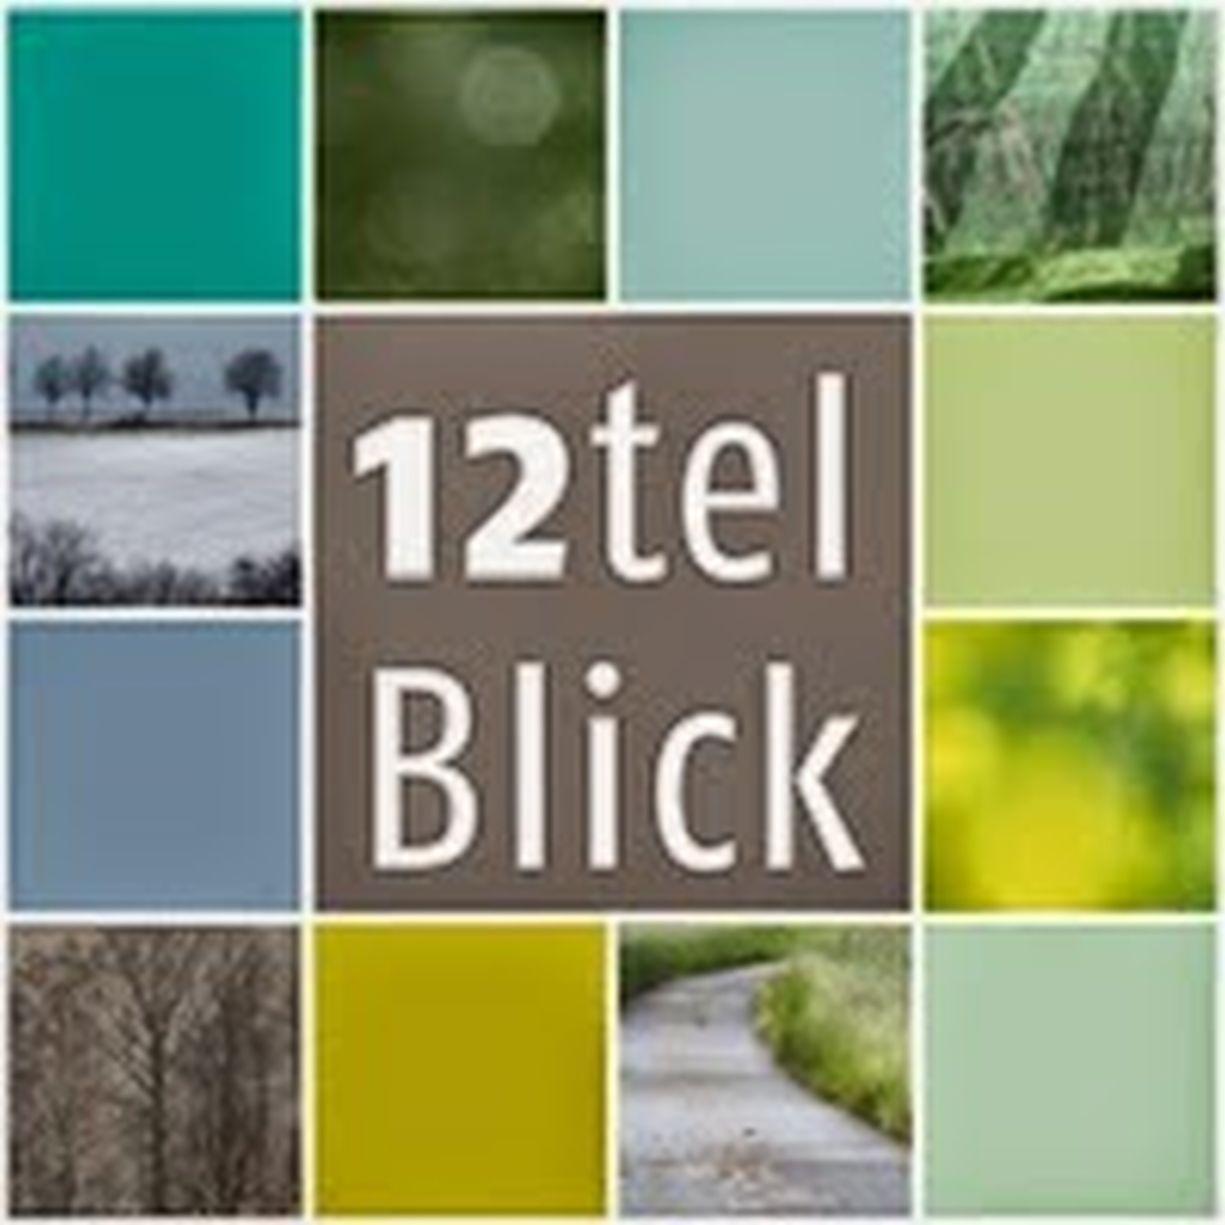 http://tabea-heinicker.blogspot.de/